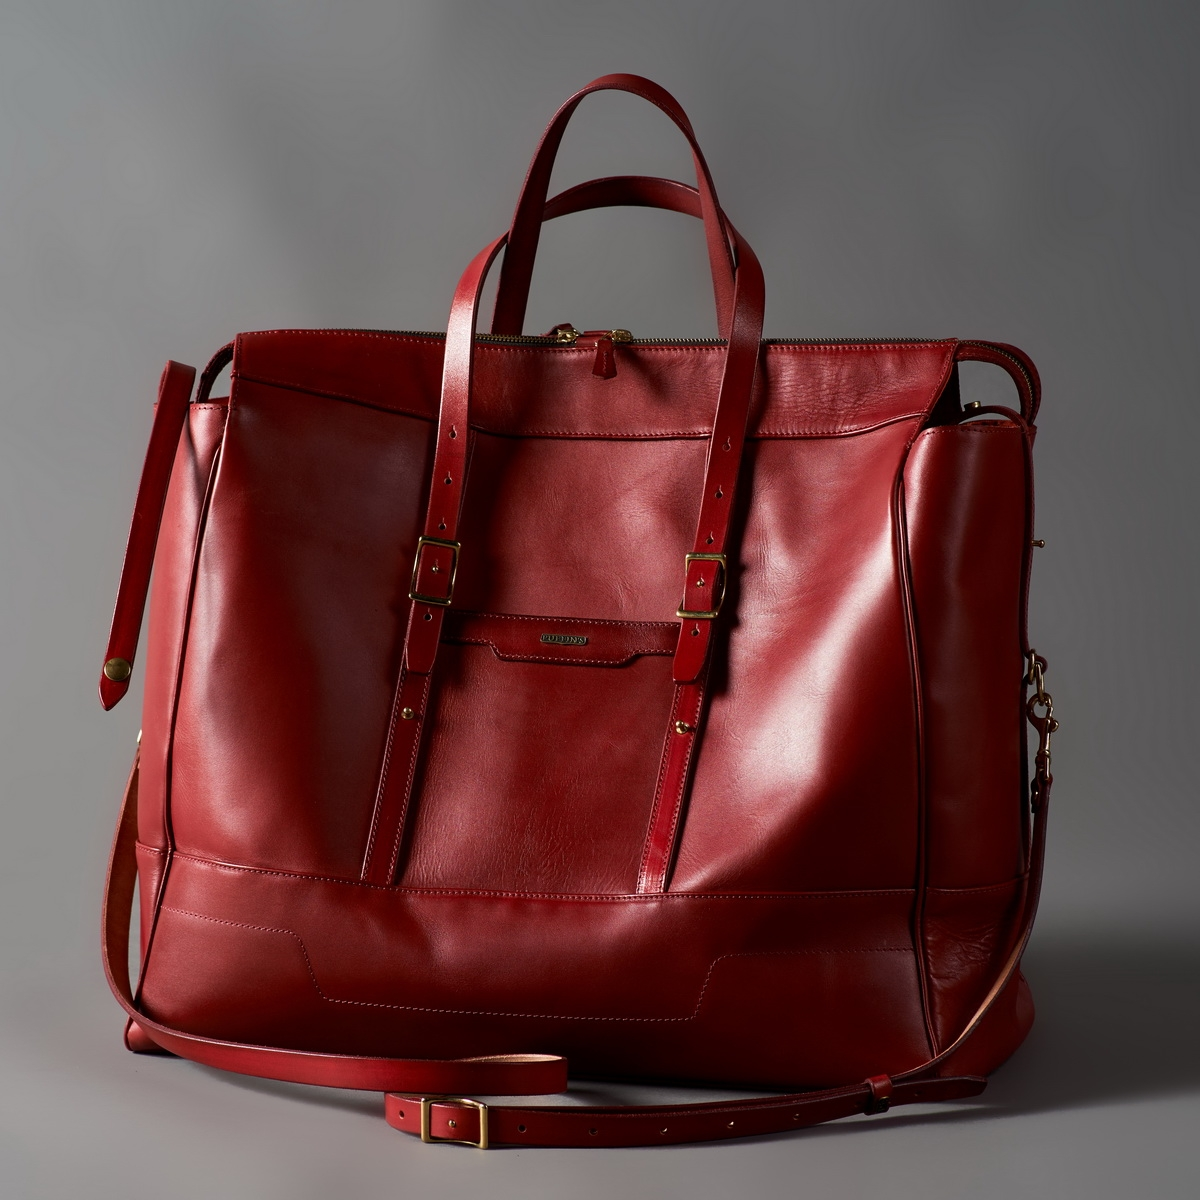 дорожная сумка weekender красная смородина